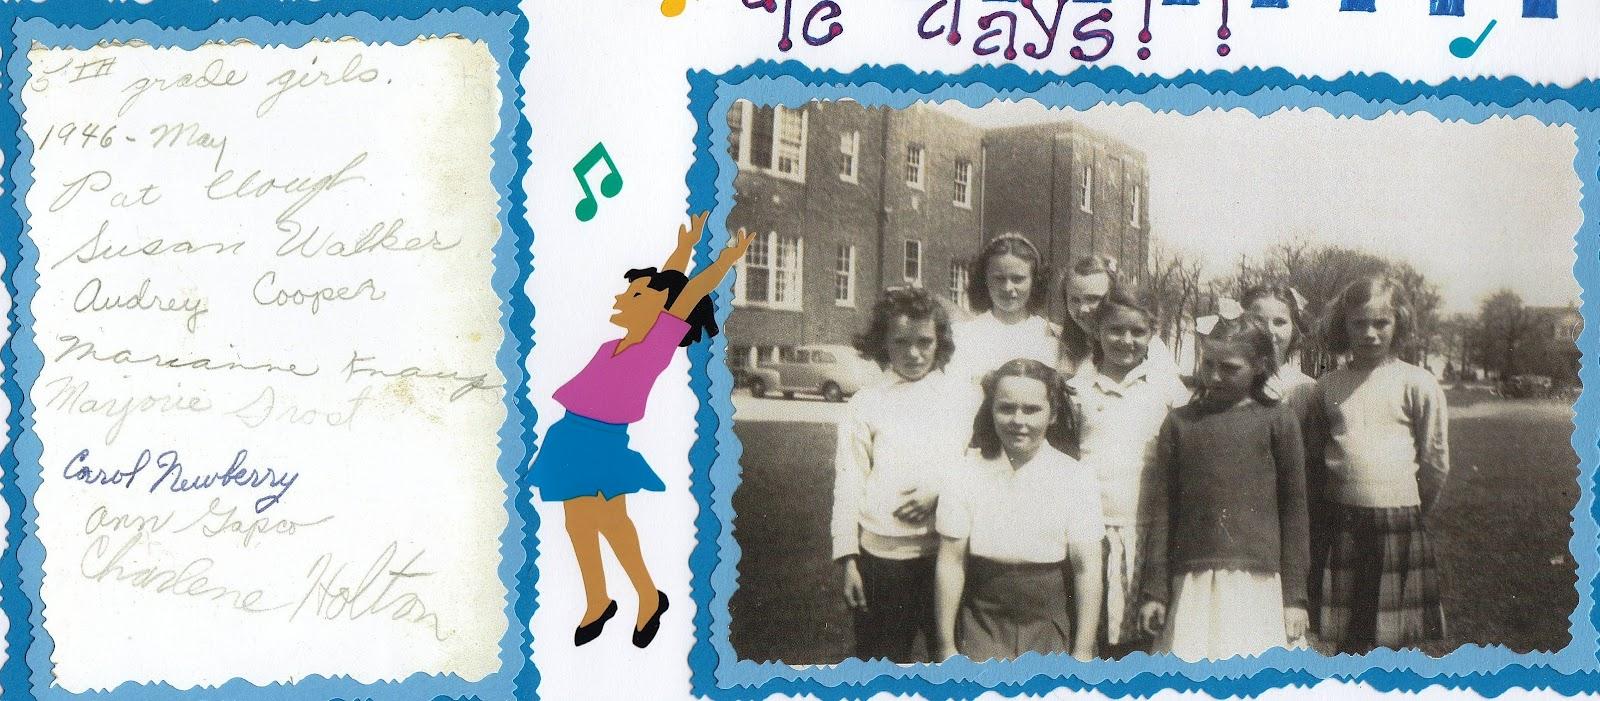 berryville girls Girls holiday hoops classic bracket berryville school phone: 870480-4632 fax: 870480-4635 berryville high school 902 w trimble ave berryville.